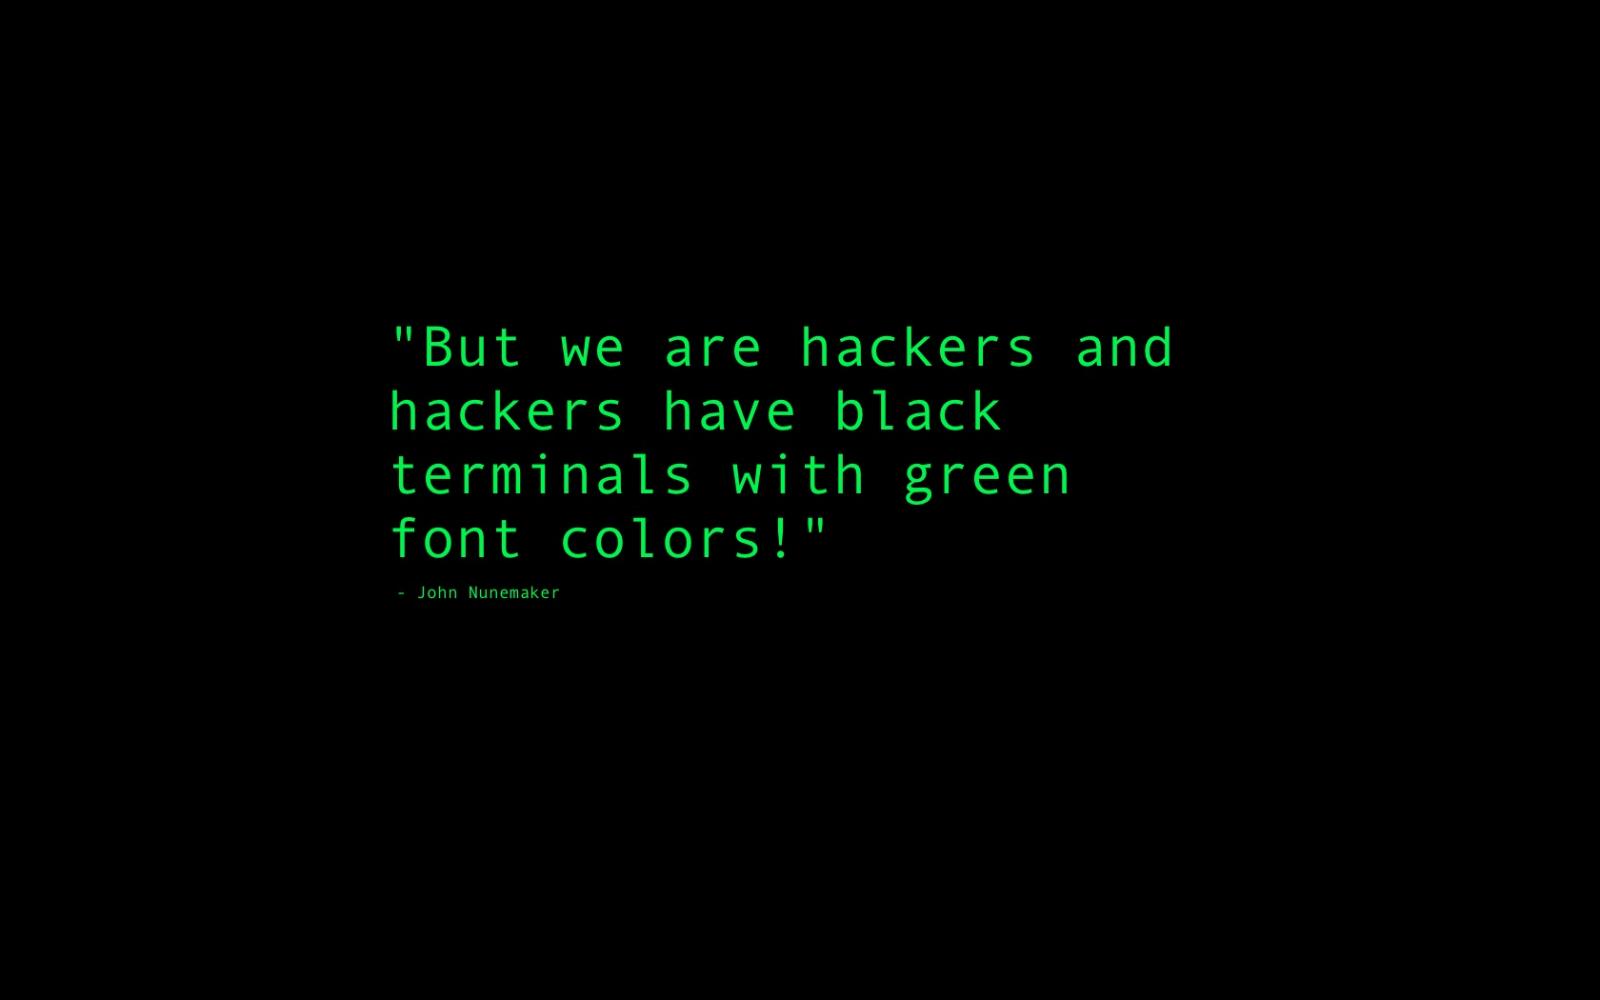 http://4.bp.blogspot.com/-hm1ZLEvrjL4/TzSods8zAoI/AAAAAAAAAHY/P7rpfuDQnyY/s1600/www.Vvallpaper.net_john_nunemaker_hacker_pirate_black_and_green_hack_hacking_text_document_desktop_wallpaper_background.jpg